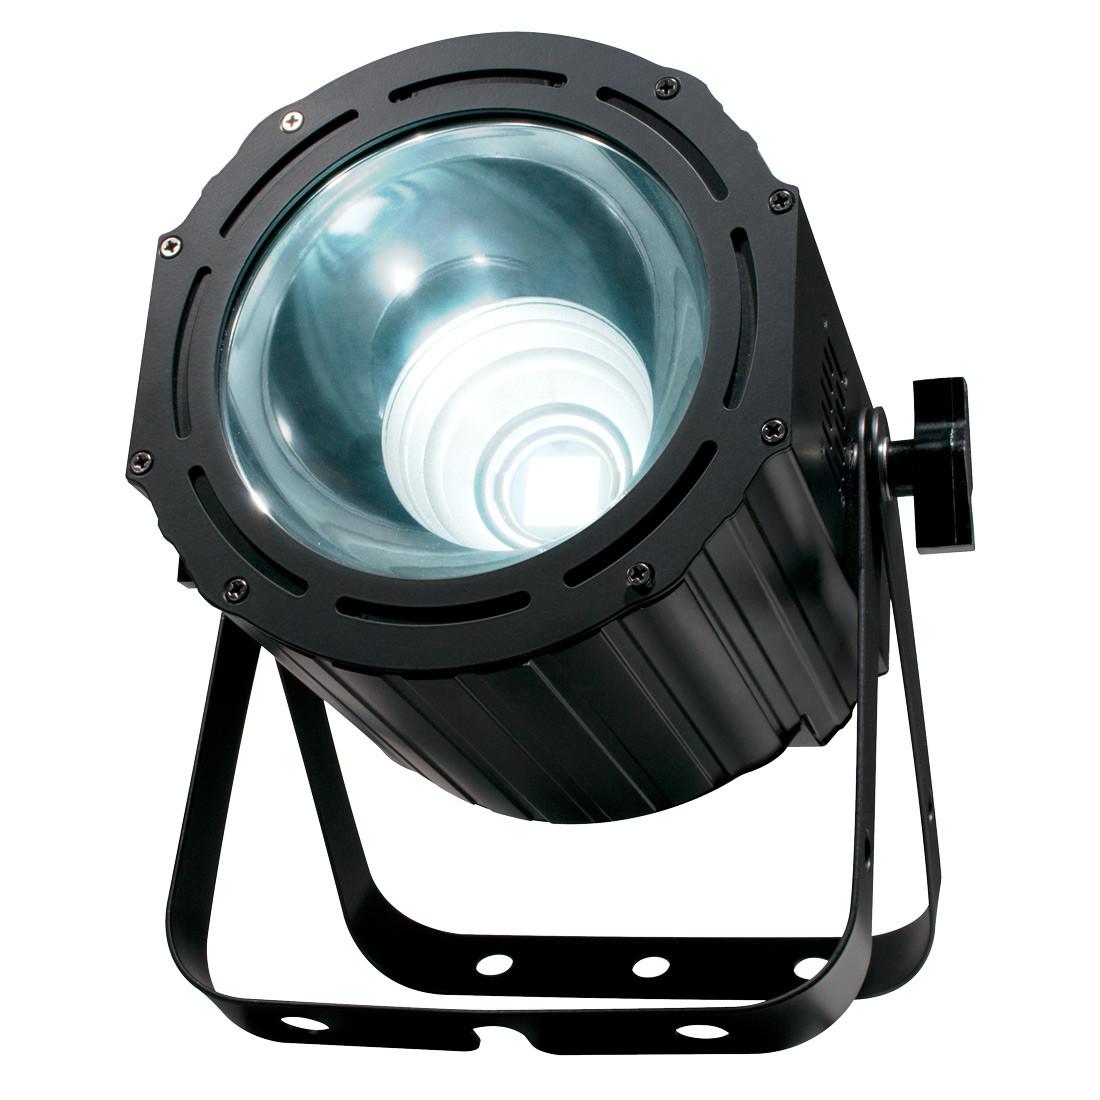 Lightning COB CANNON  sc 1 st  American DJ & Lightning COB CANNON - Product Archive Light - Lights - Products ... azcodes.com